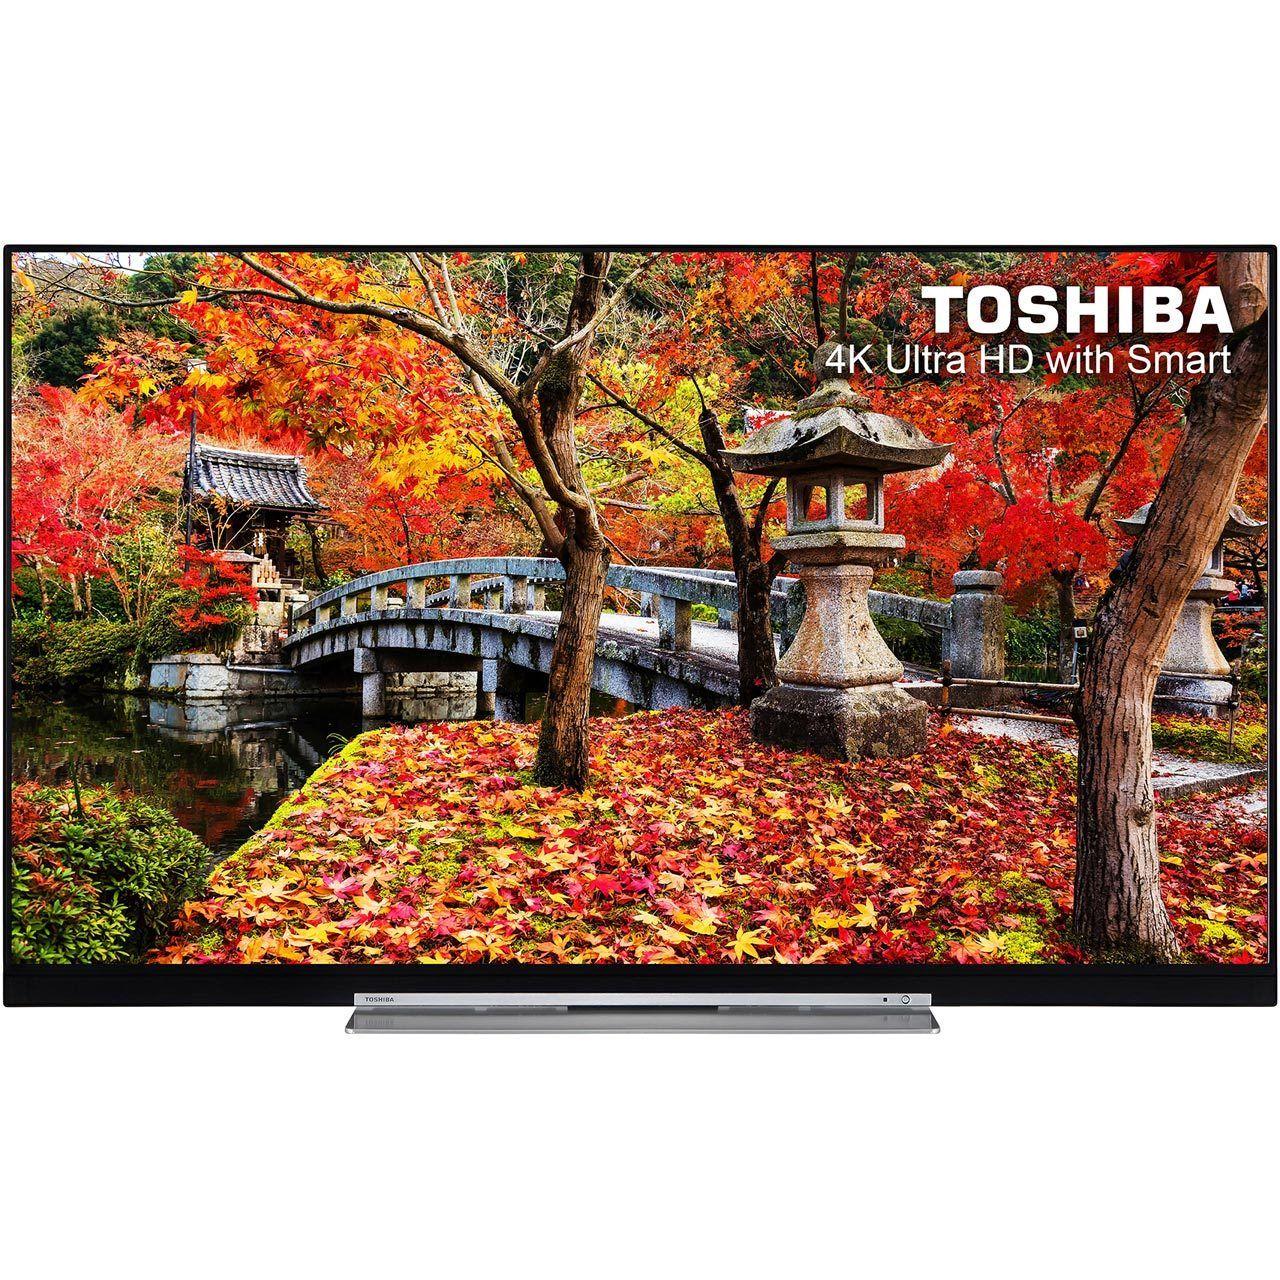 Toshiba 49U7763DB 49 Inch Smart LED TV 4K £299 / Toshiba 55U6663DB 55 Inch Smart LED TV 4K Ultra HD Freeview HD 4 HDMI £379 @ AO/Ebay